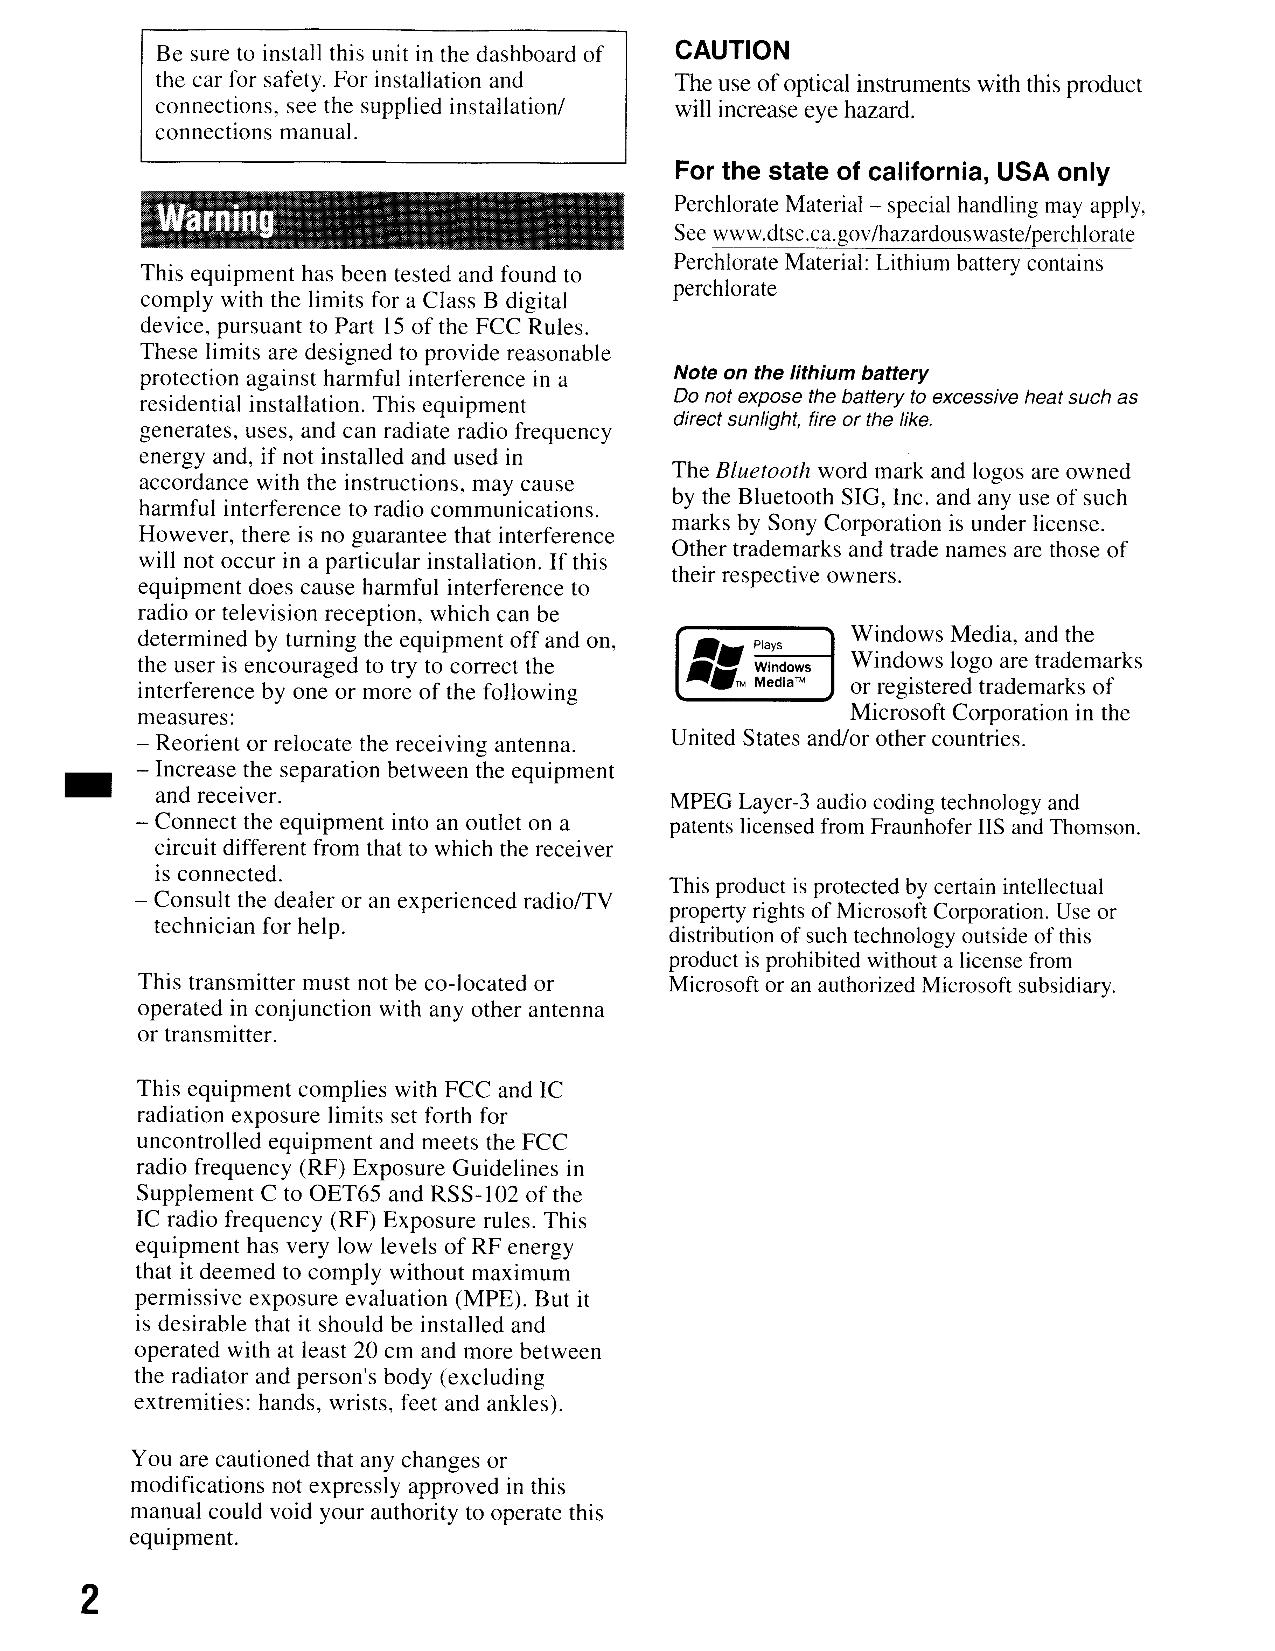 158mexbt27.pdf 1 pdf manual for sony car receiver xplod mex bt2700 sony mex-bt2700 manual pdf at n-0.co